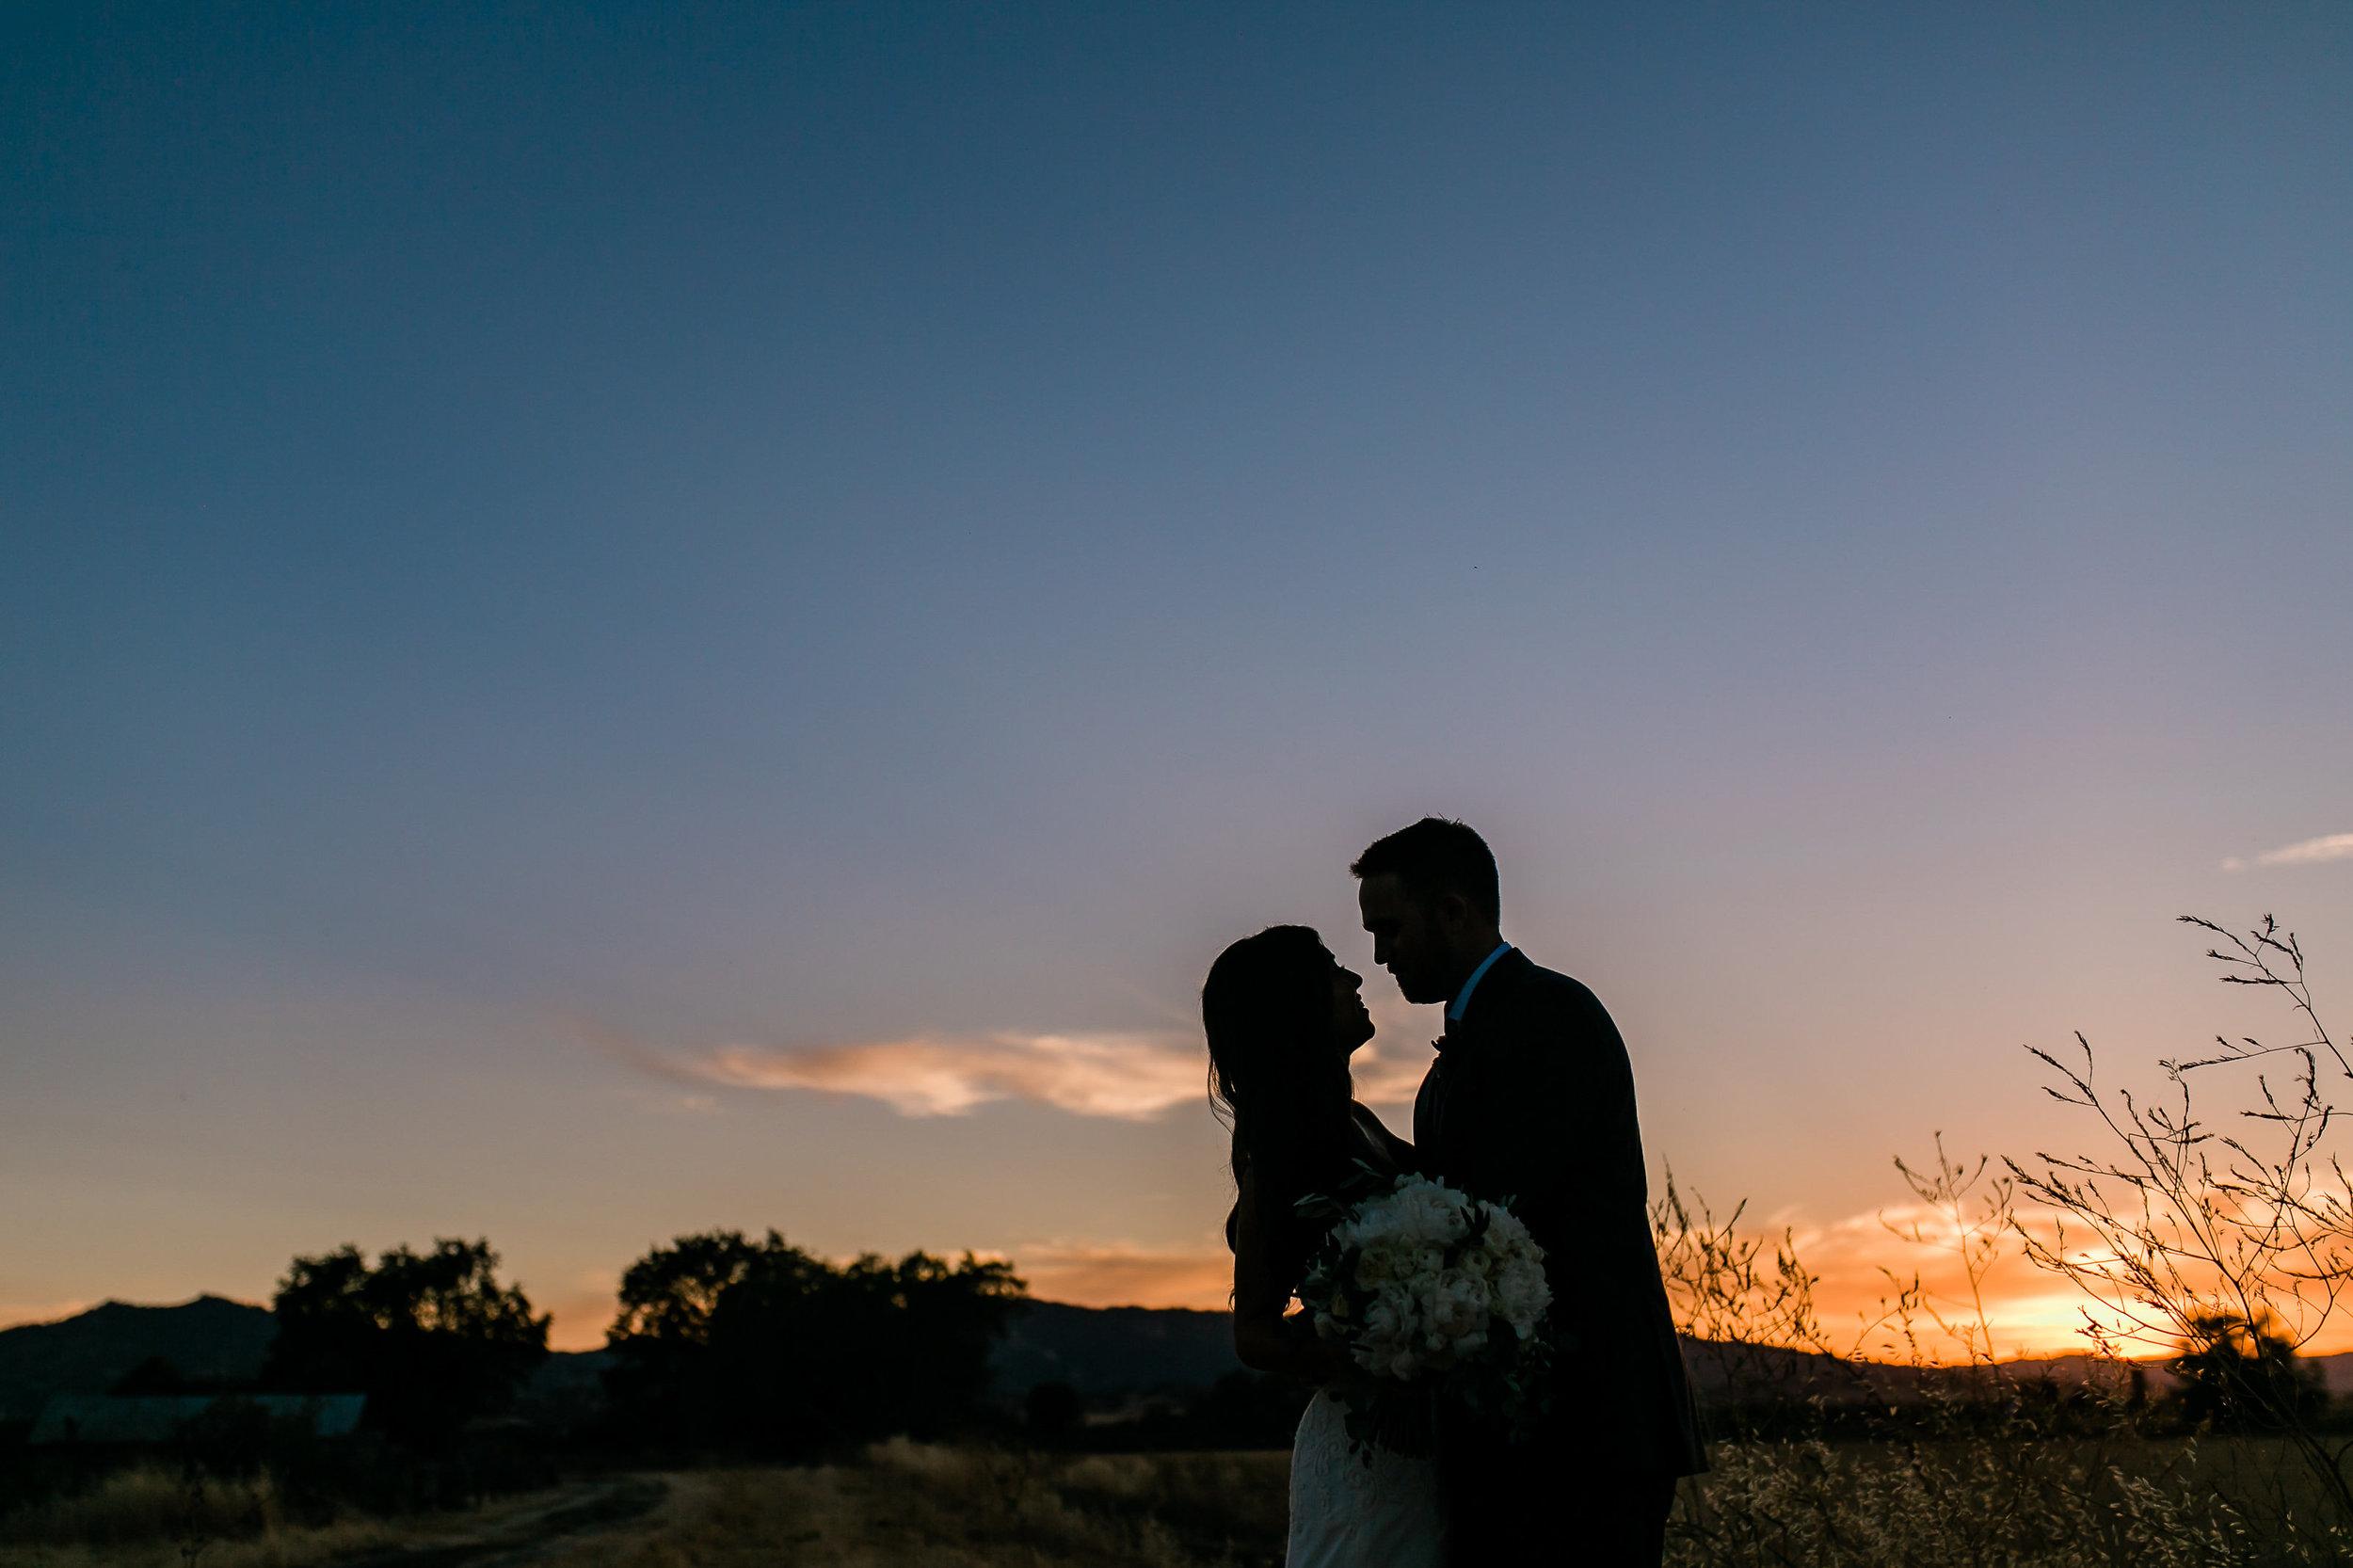 Park Winters Summer Wedding | Country Wedding | Farm Wedding | Bride and Groom Portrait | Sunset Photos